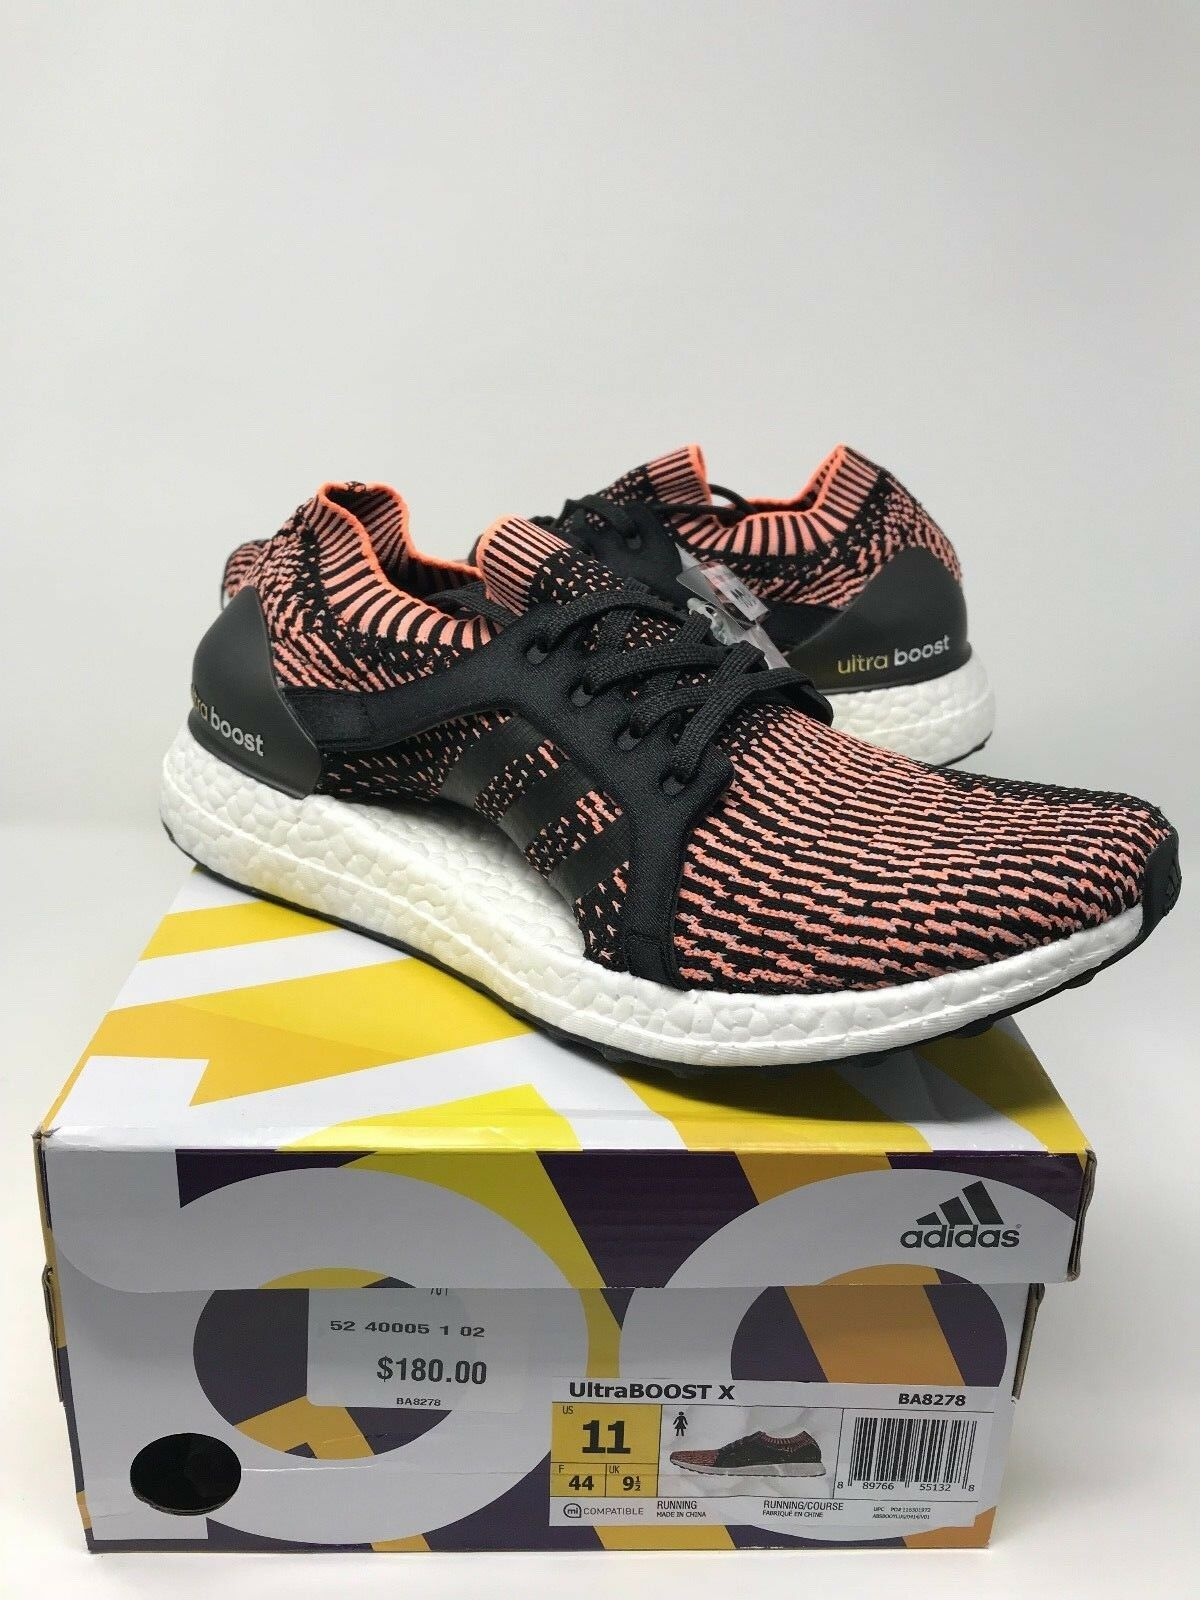 0abc0959a9e NEW Adidas Women X Ultra Boost Primeknit Sneakers Black Orange BA8278 Size  11